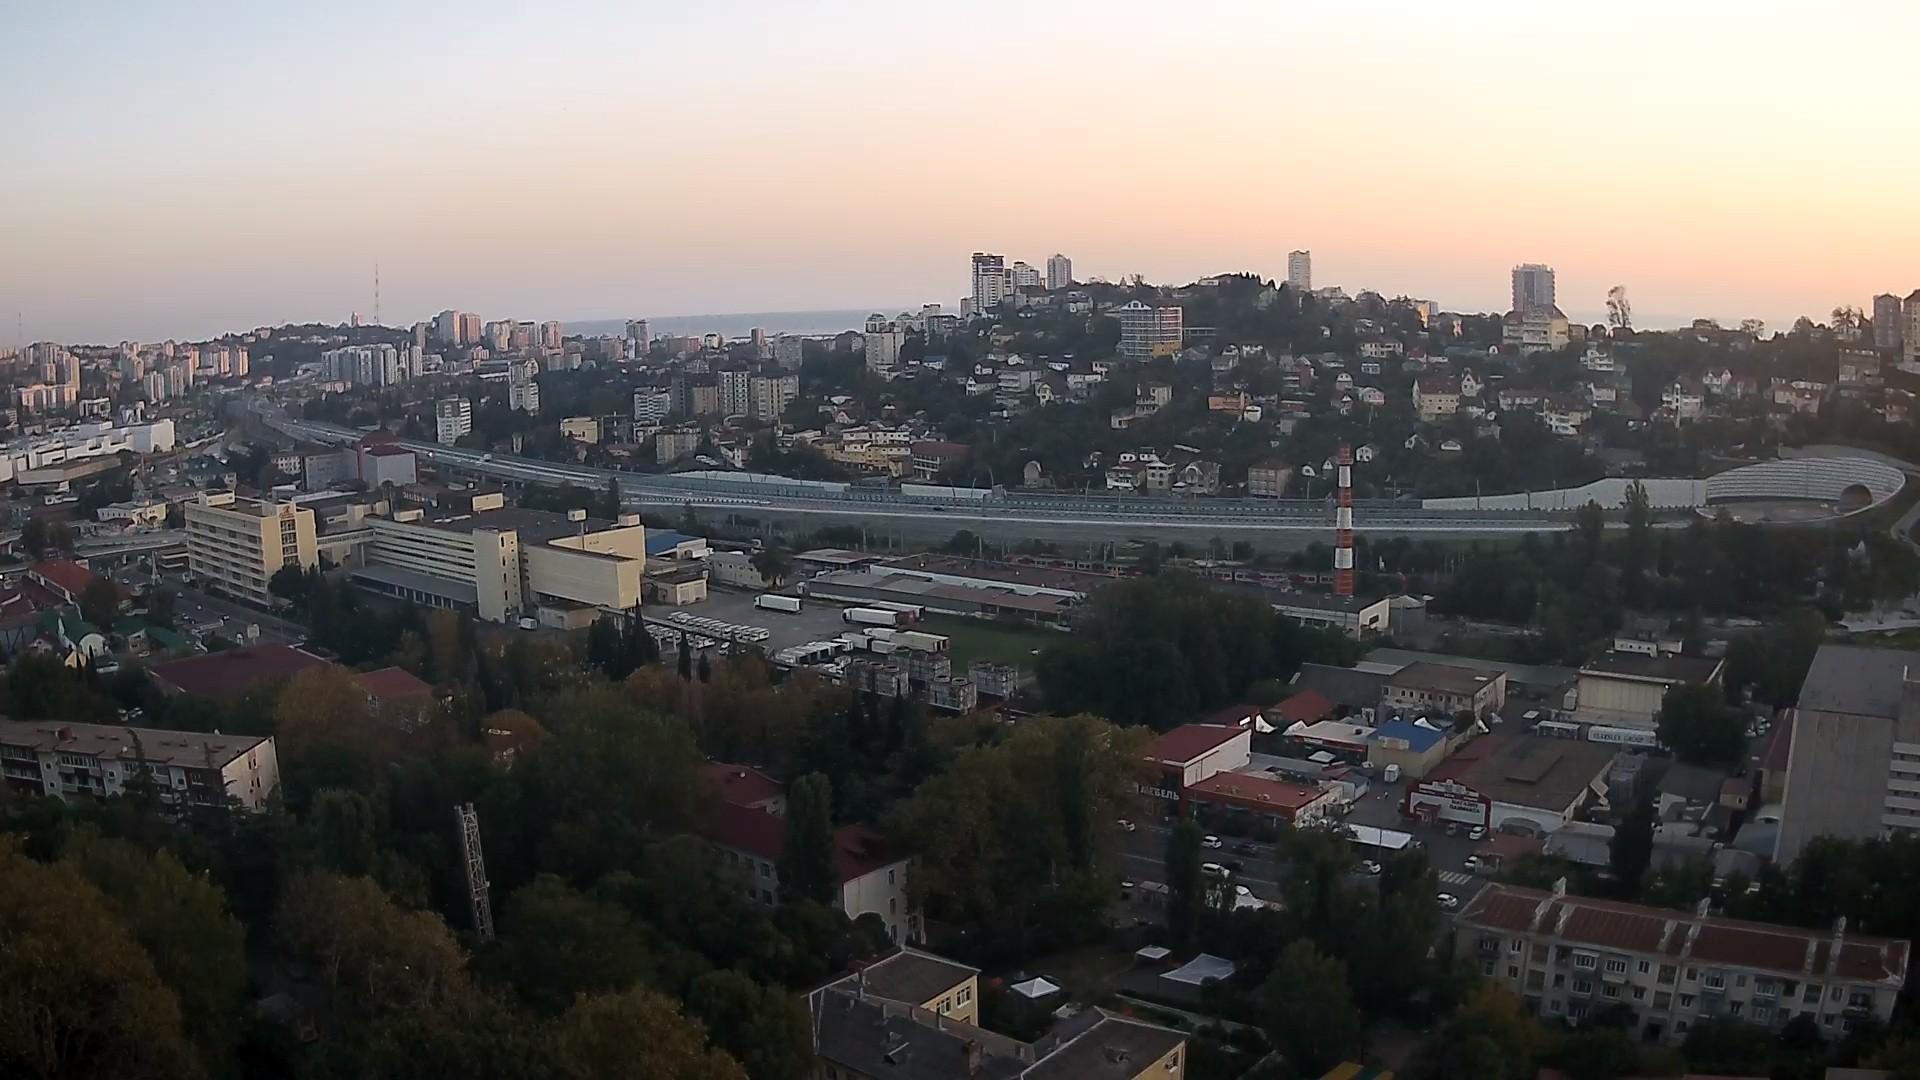 Вебкамера Панорама «Дублер курортного проспекта» в г. Сочи